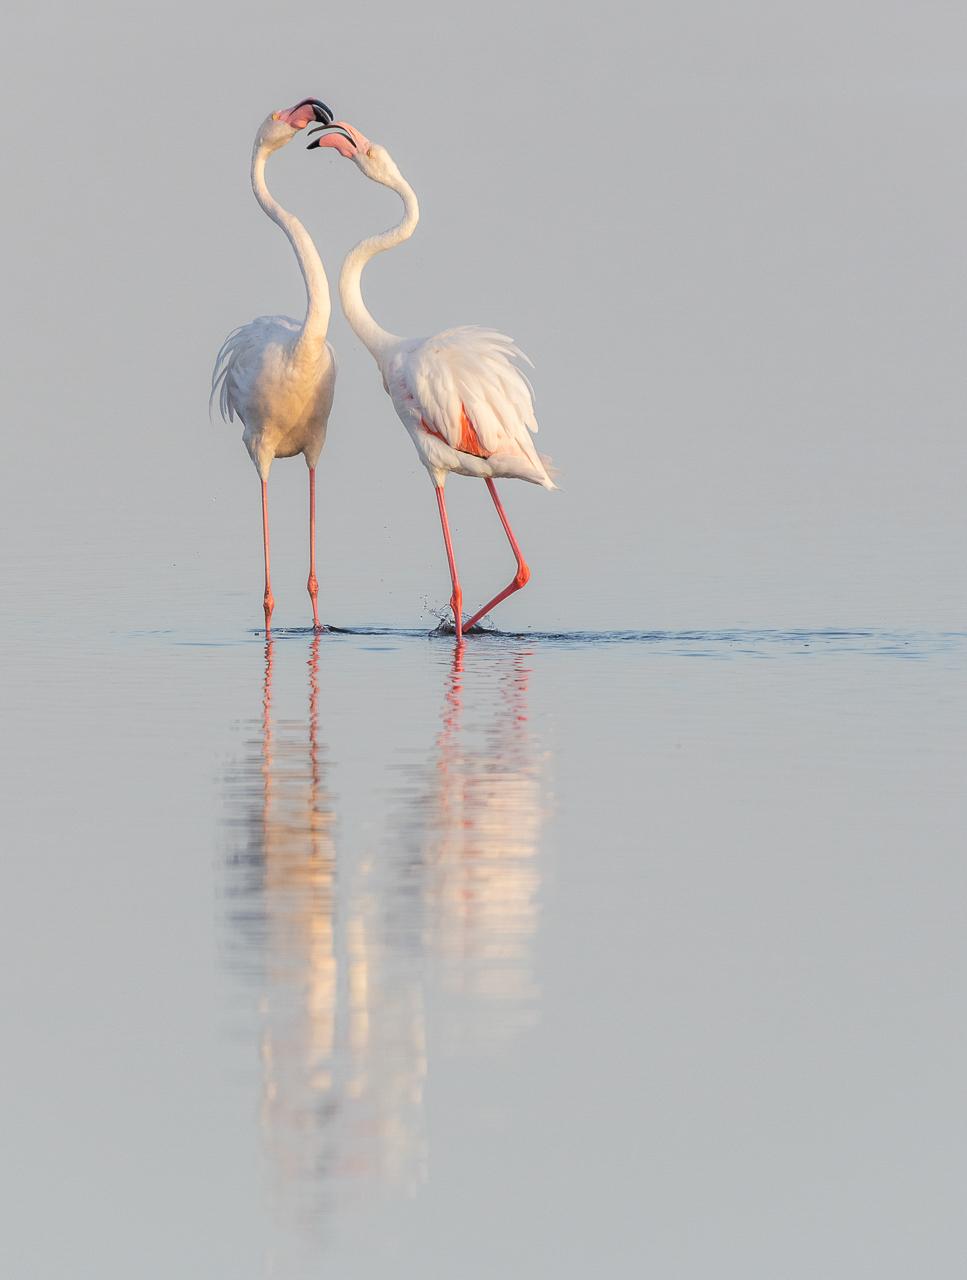 50Open_Lily_Chang_2_Cuddling_Flamingos